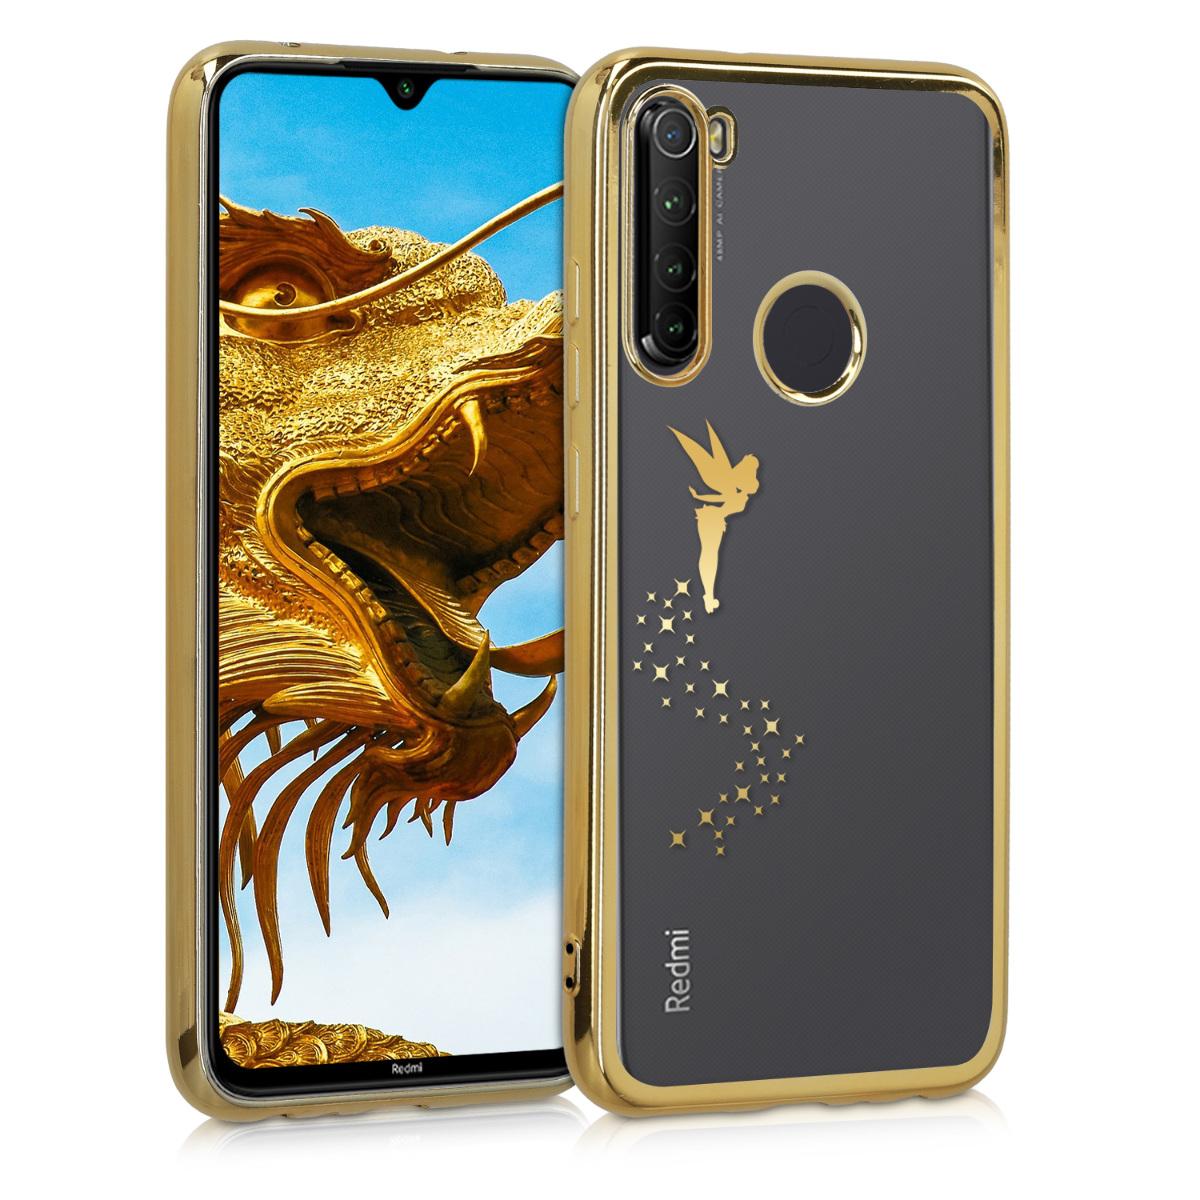 KW Θήκη Σιλικόνης Xiaomi Redmi Note 8 - Fairy Gold / Transparent (50991.01)